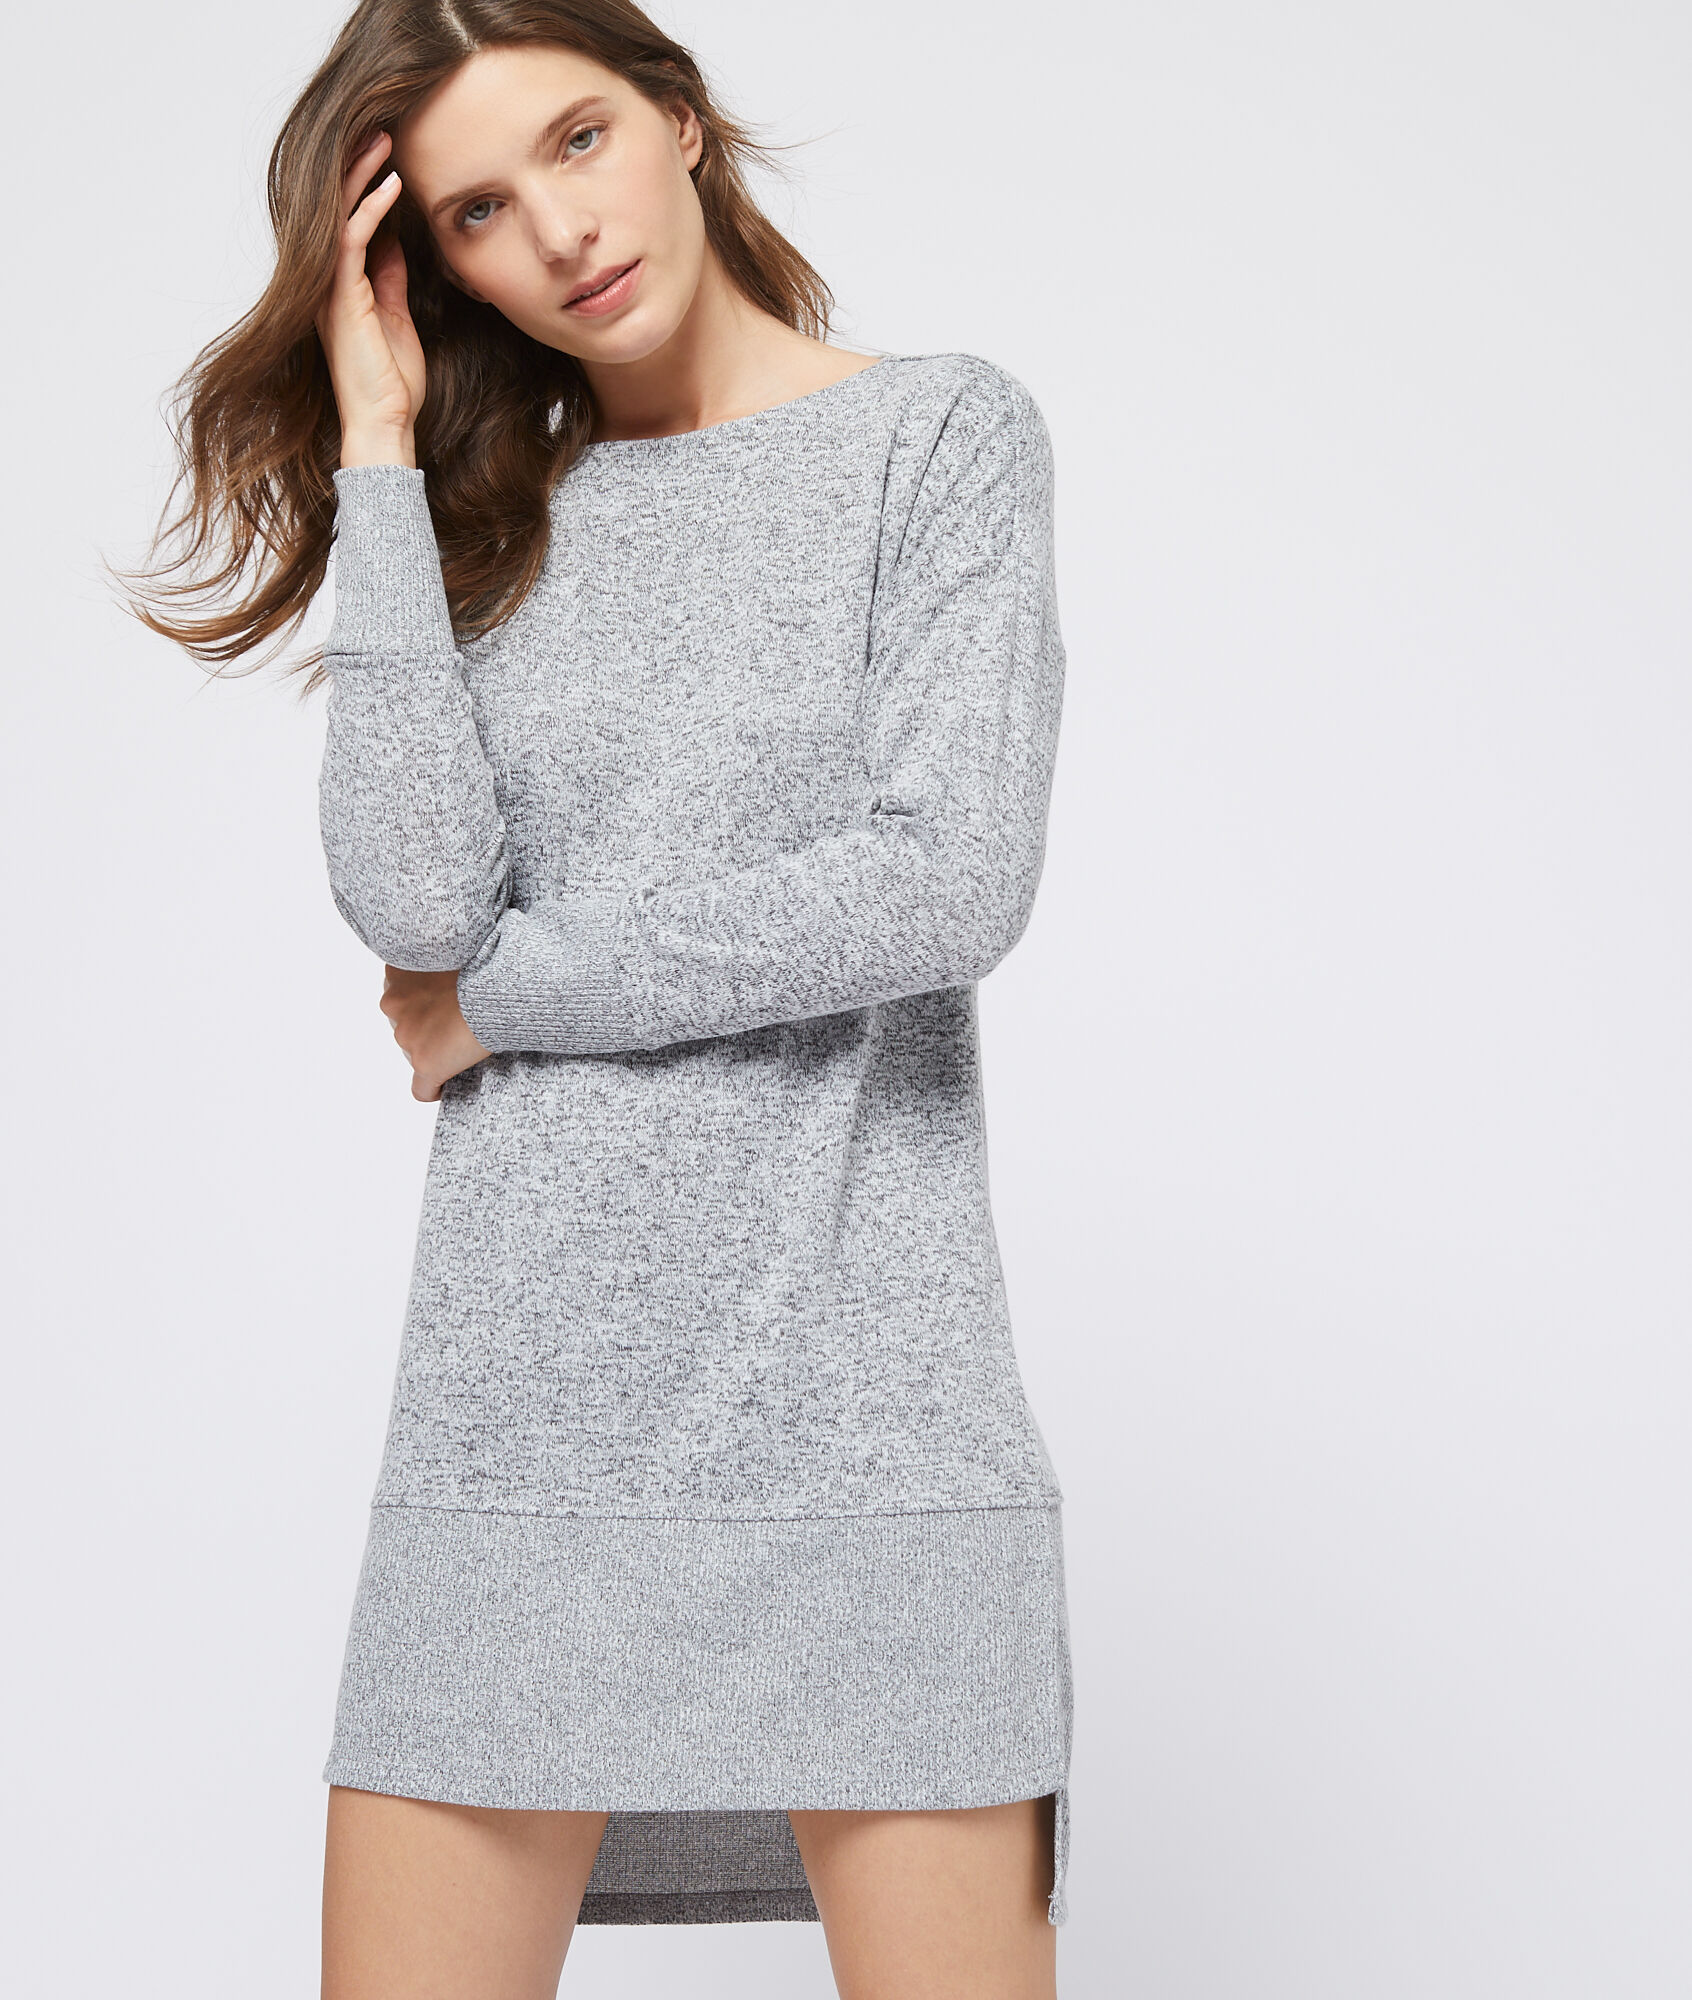 JOSY Koszula nocna loungegwear